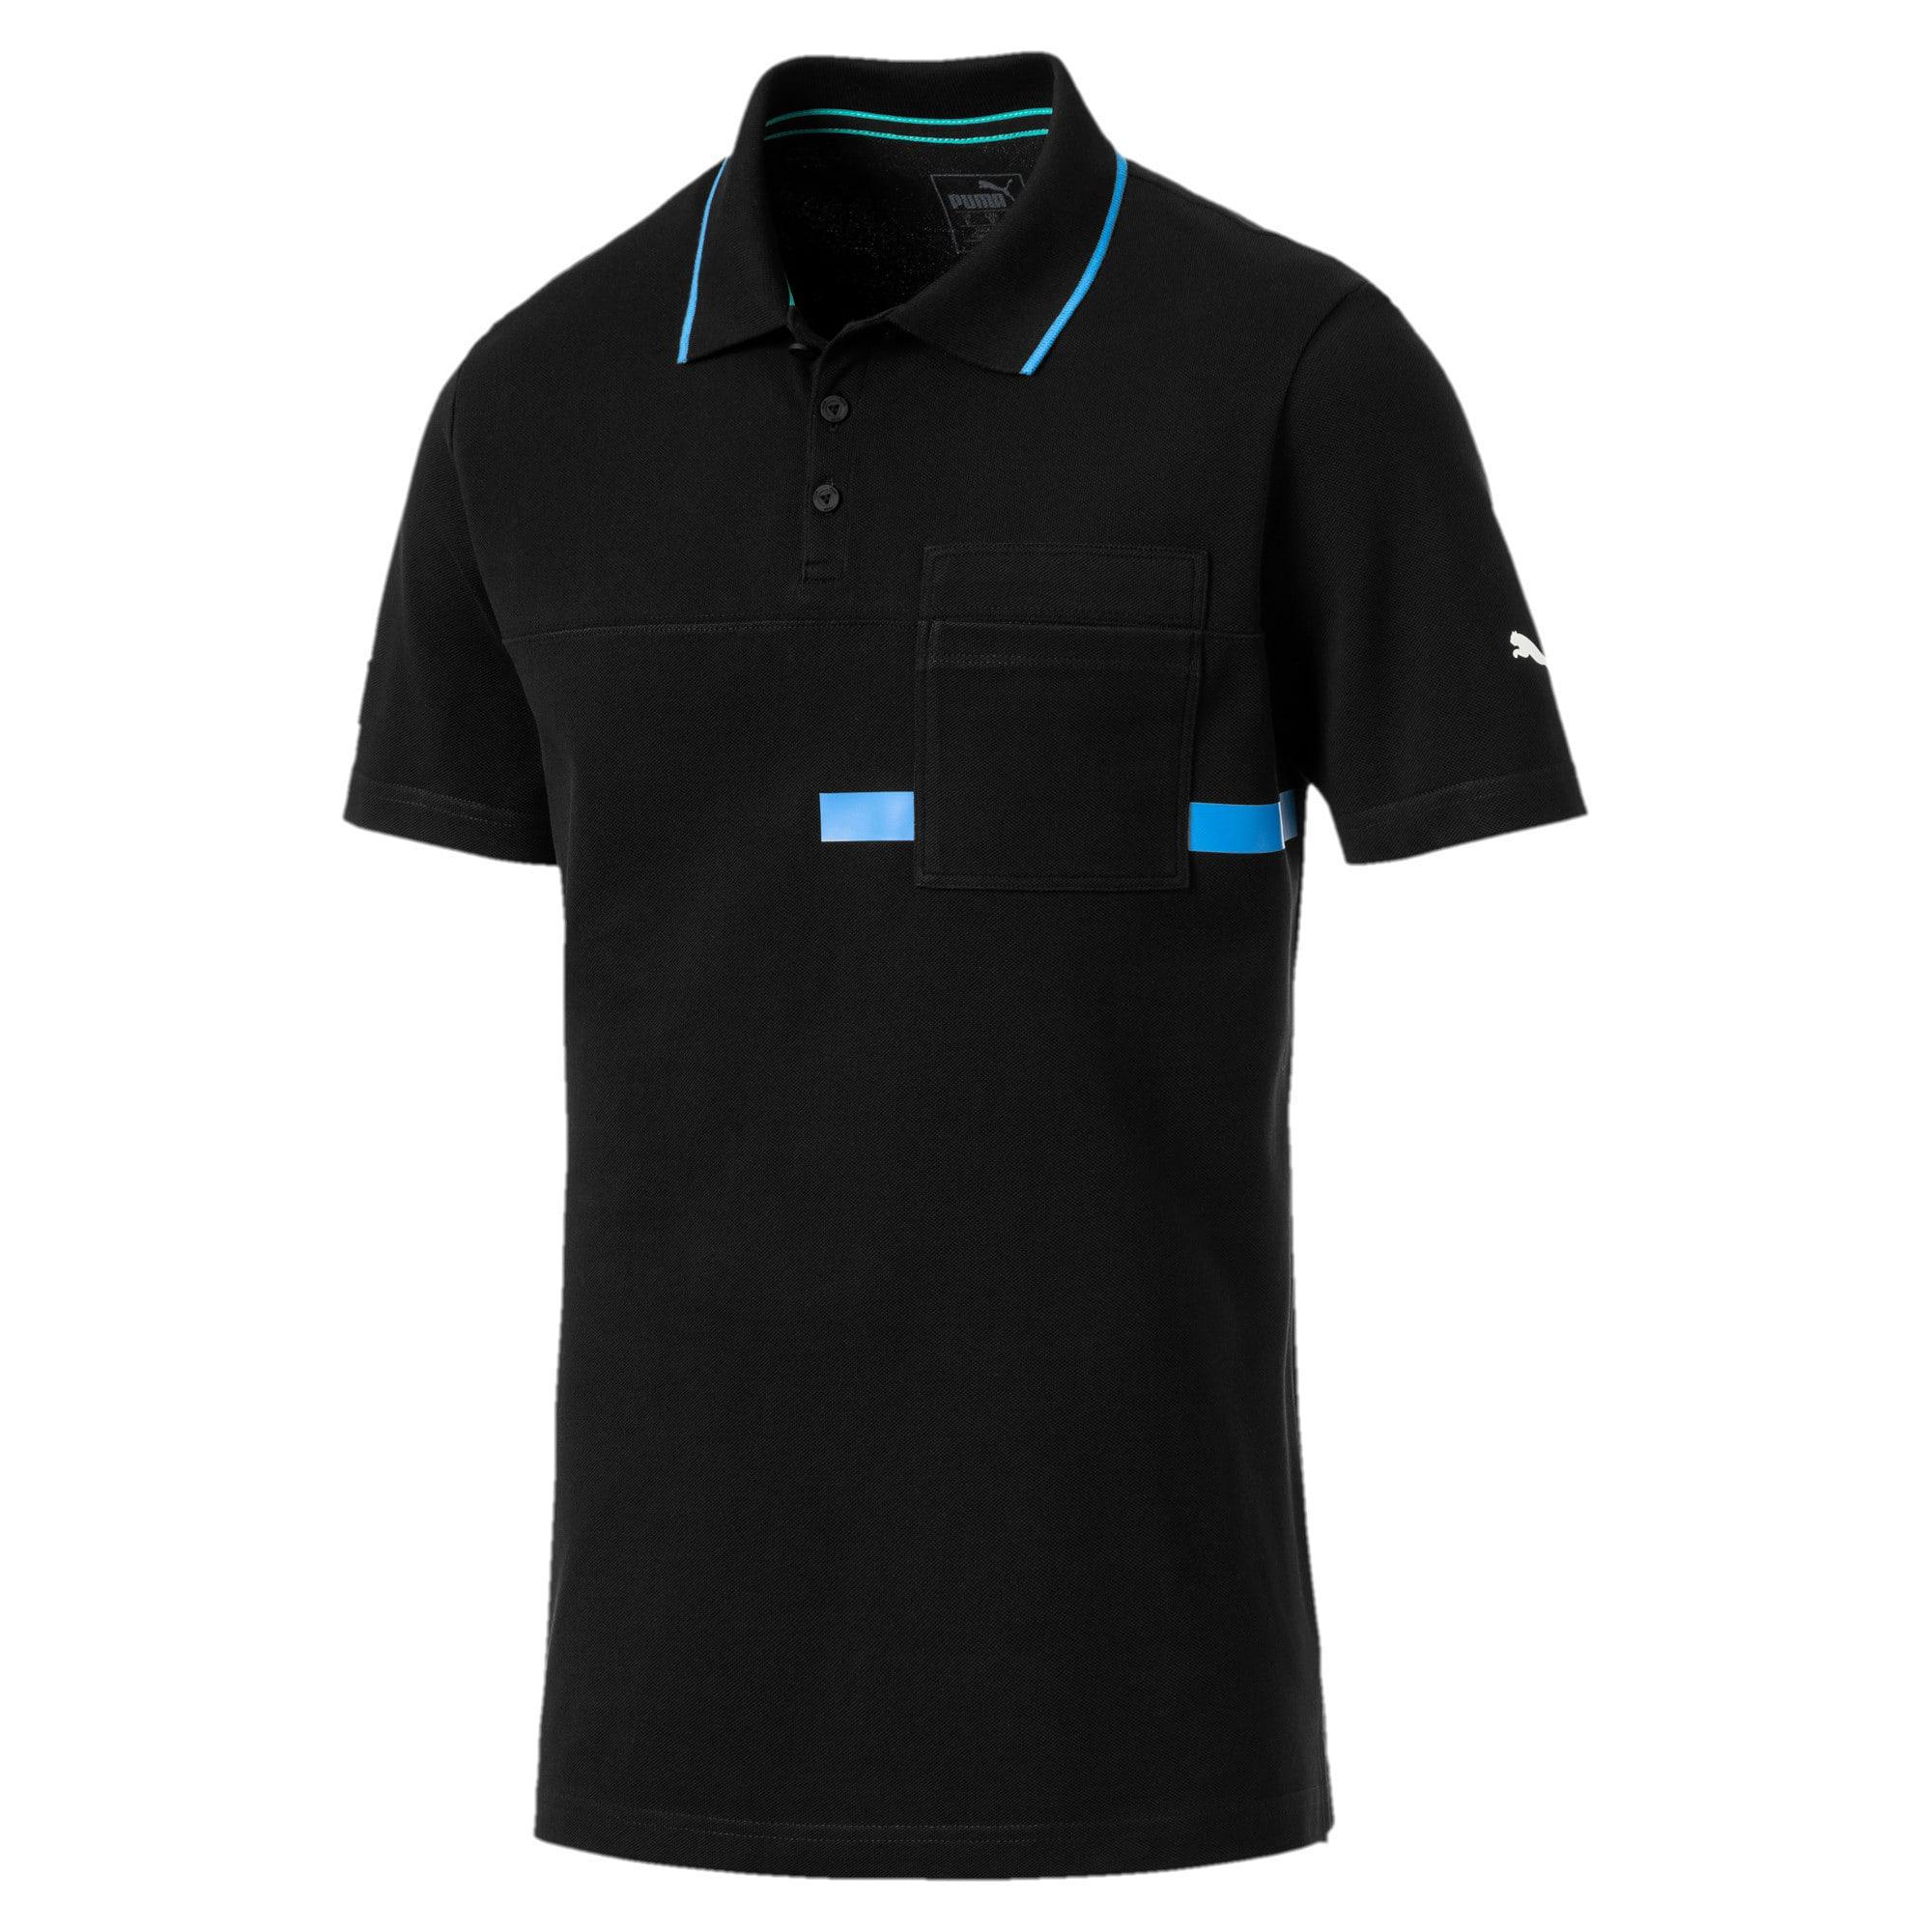 Thumbnail 3 of MERCEDES AMG PETRONAS Men's Polo Shirt, Puma Black, medium-IND